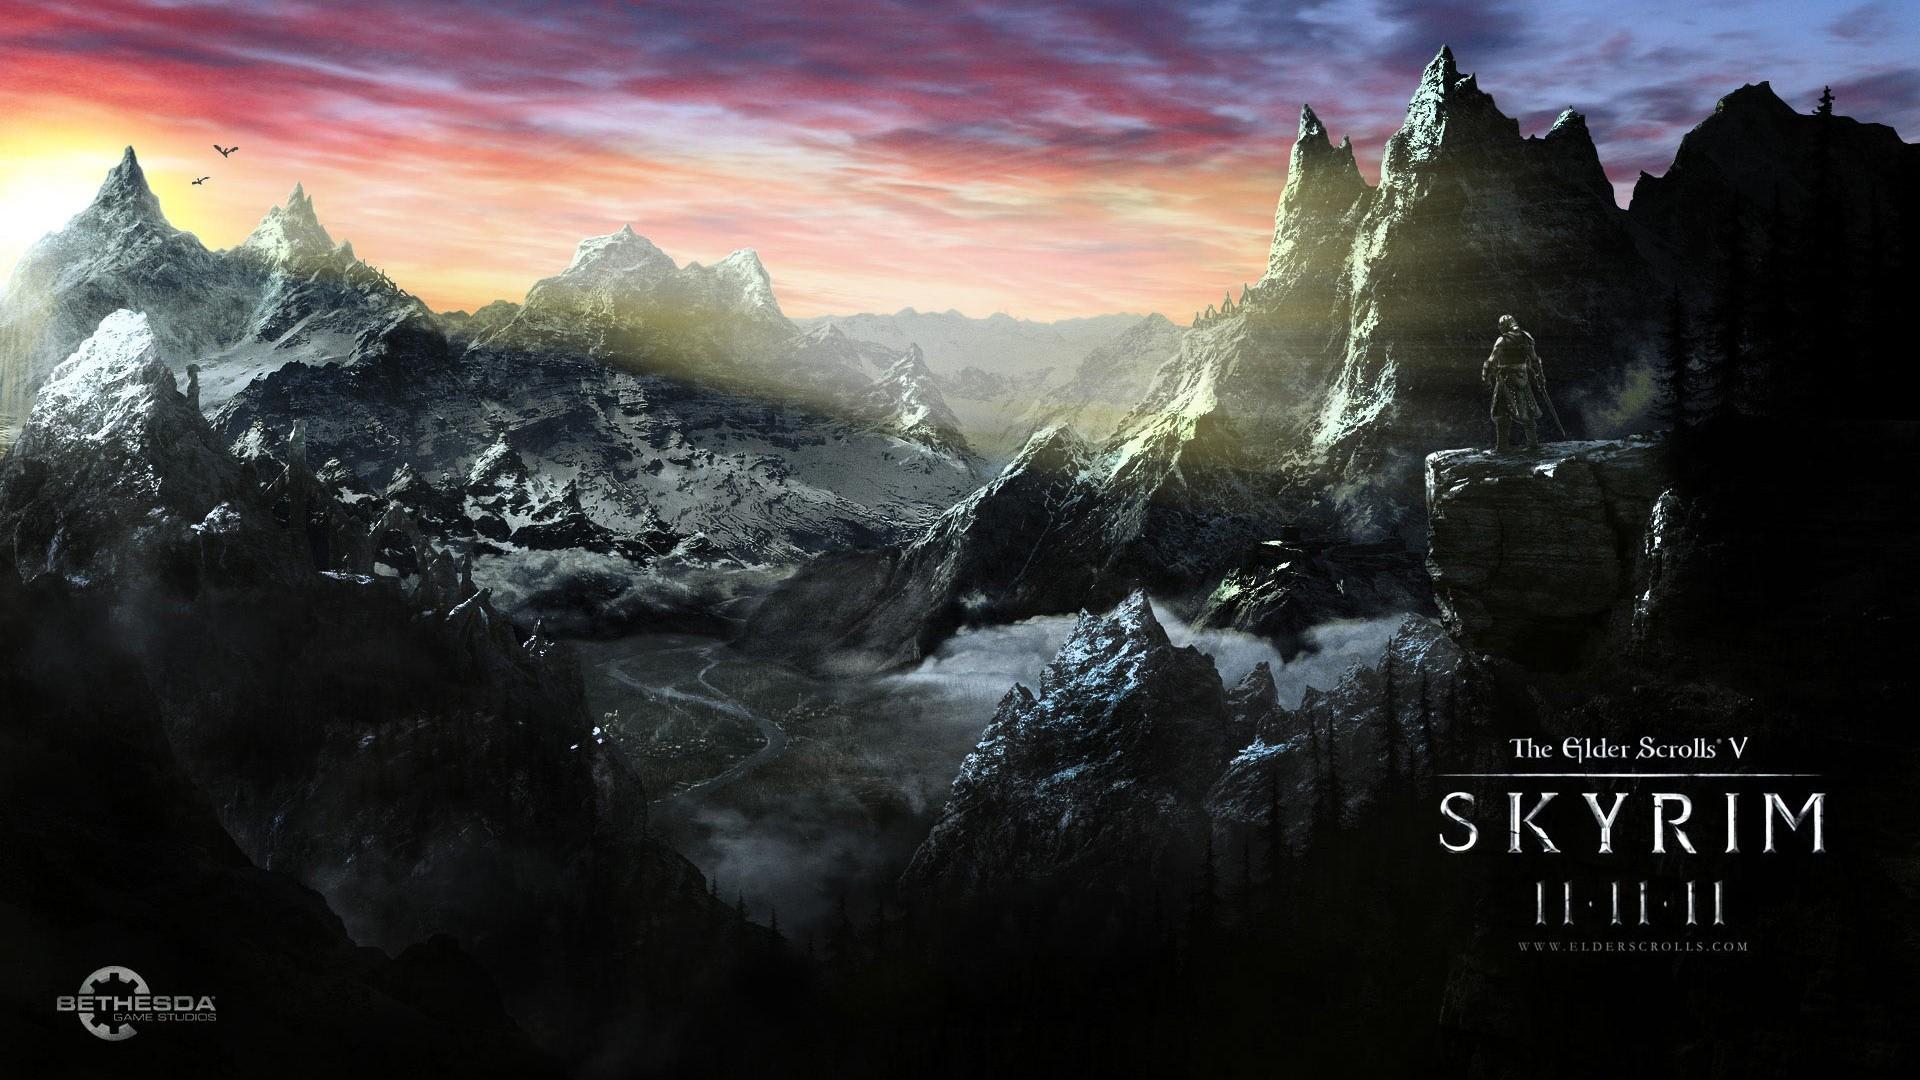 The Elder Scrolls V: Skyrim HD wallpapers #15 – Wallpaper .